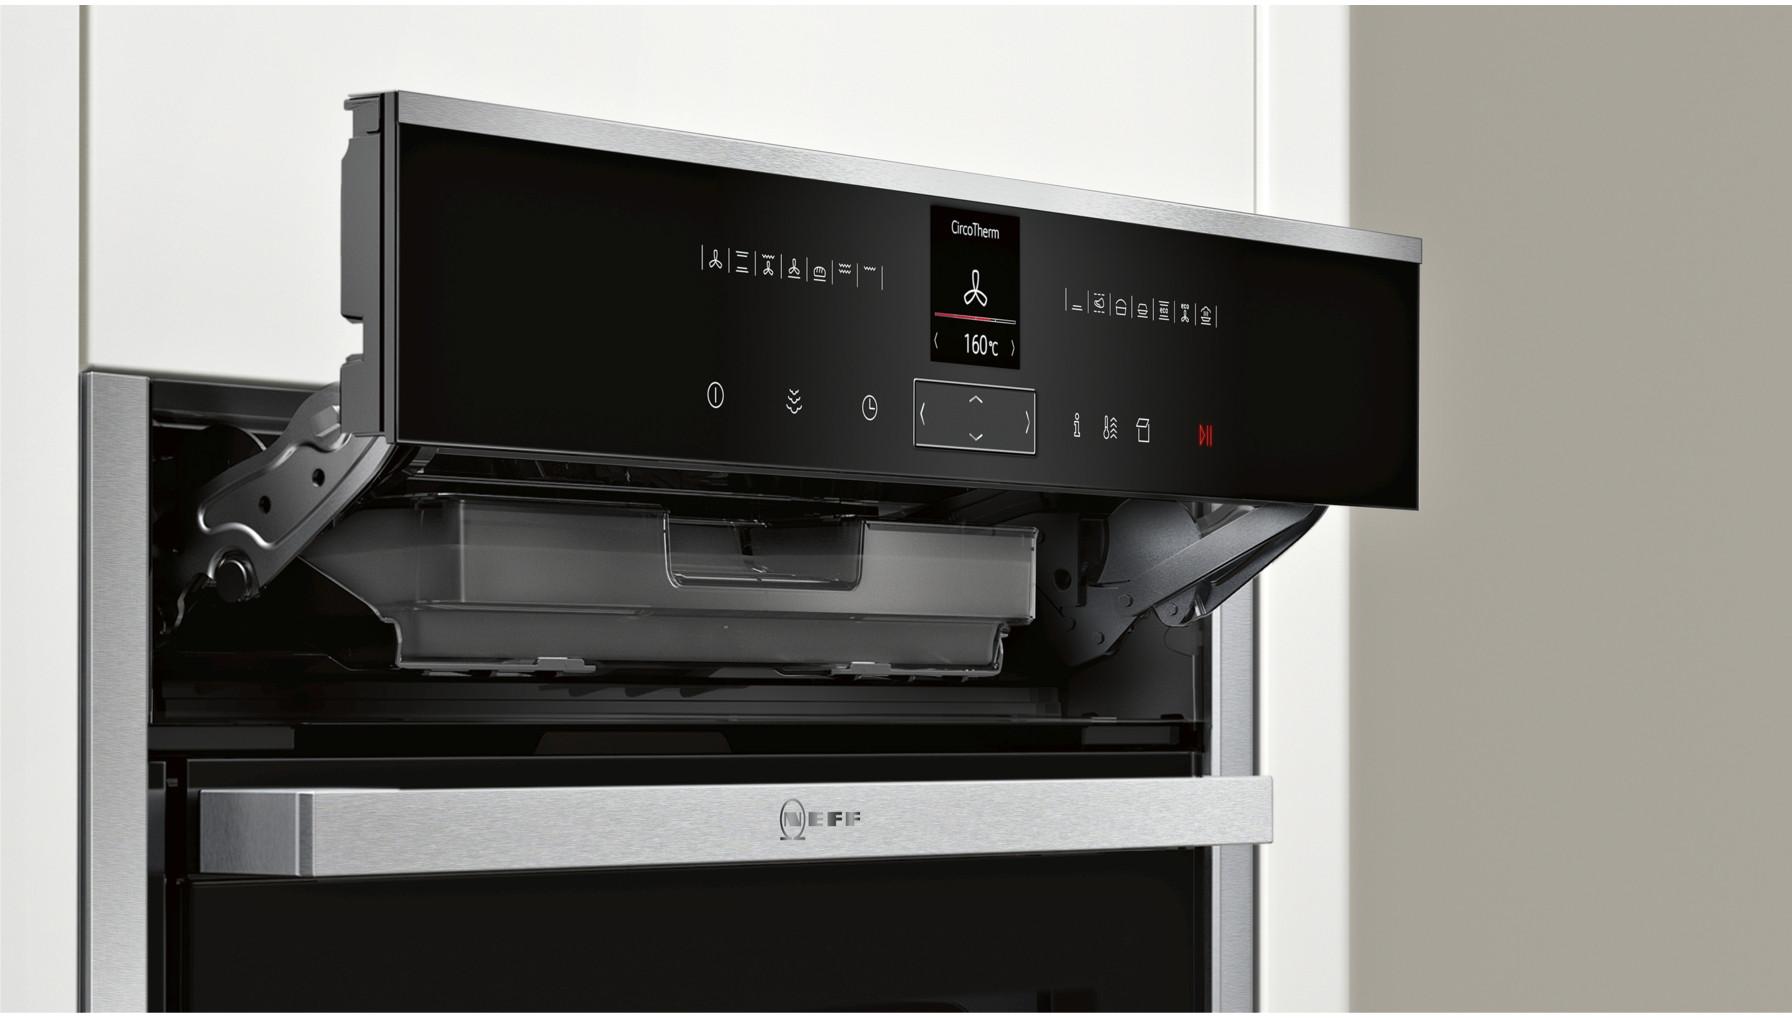 buy neff b57vr22n0b slide hide pyrolytic single oven b57vr22n0b. Black Bedroom Furniture Sets. Home Design Ideas